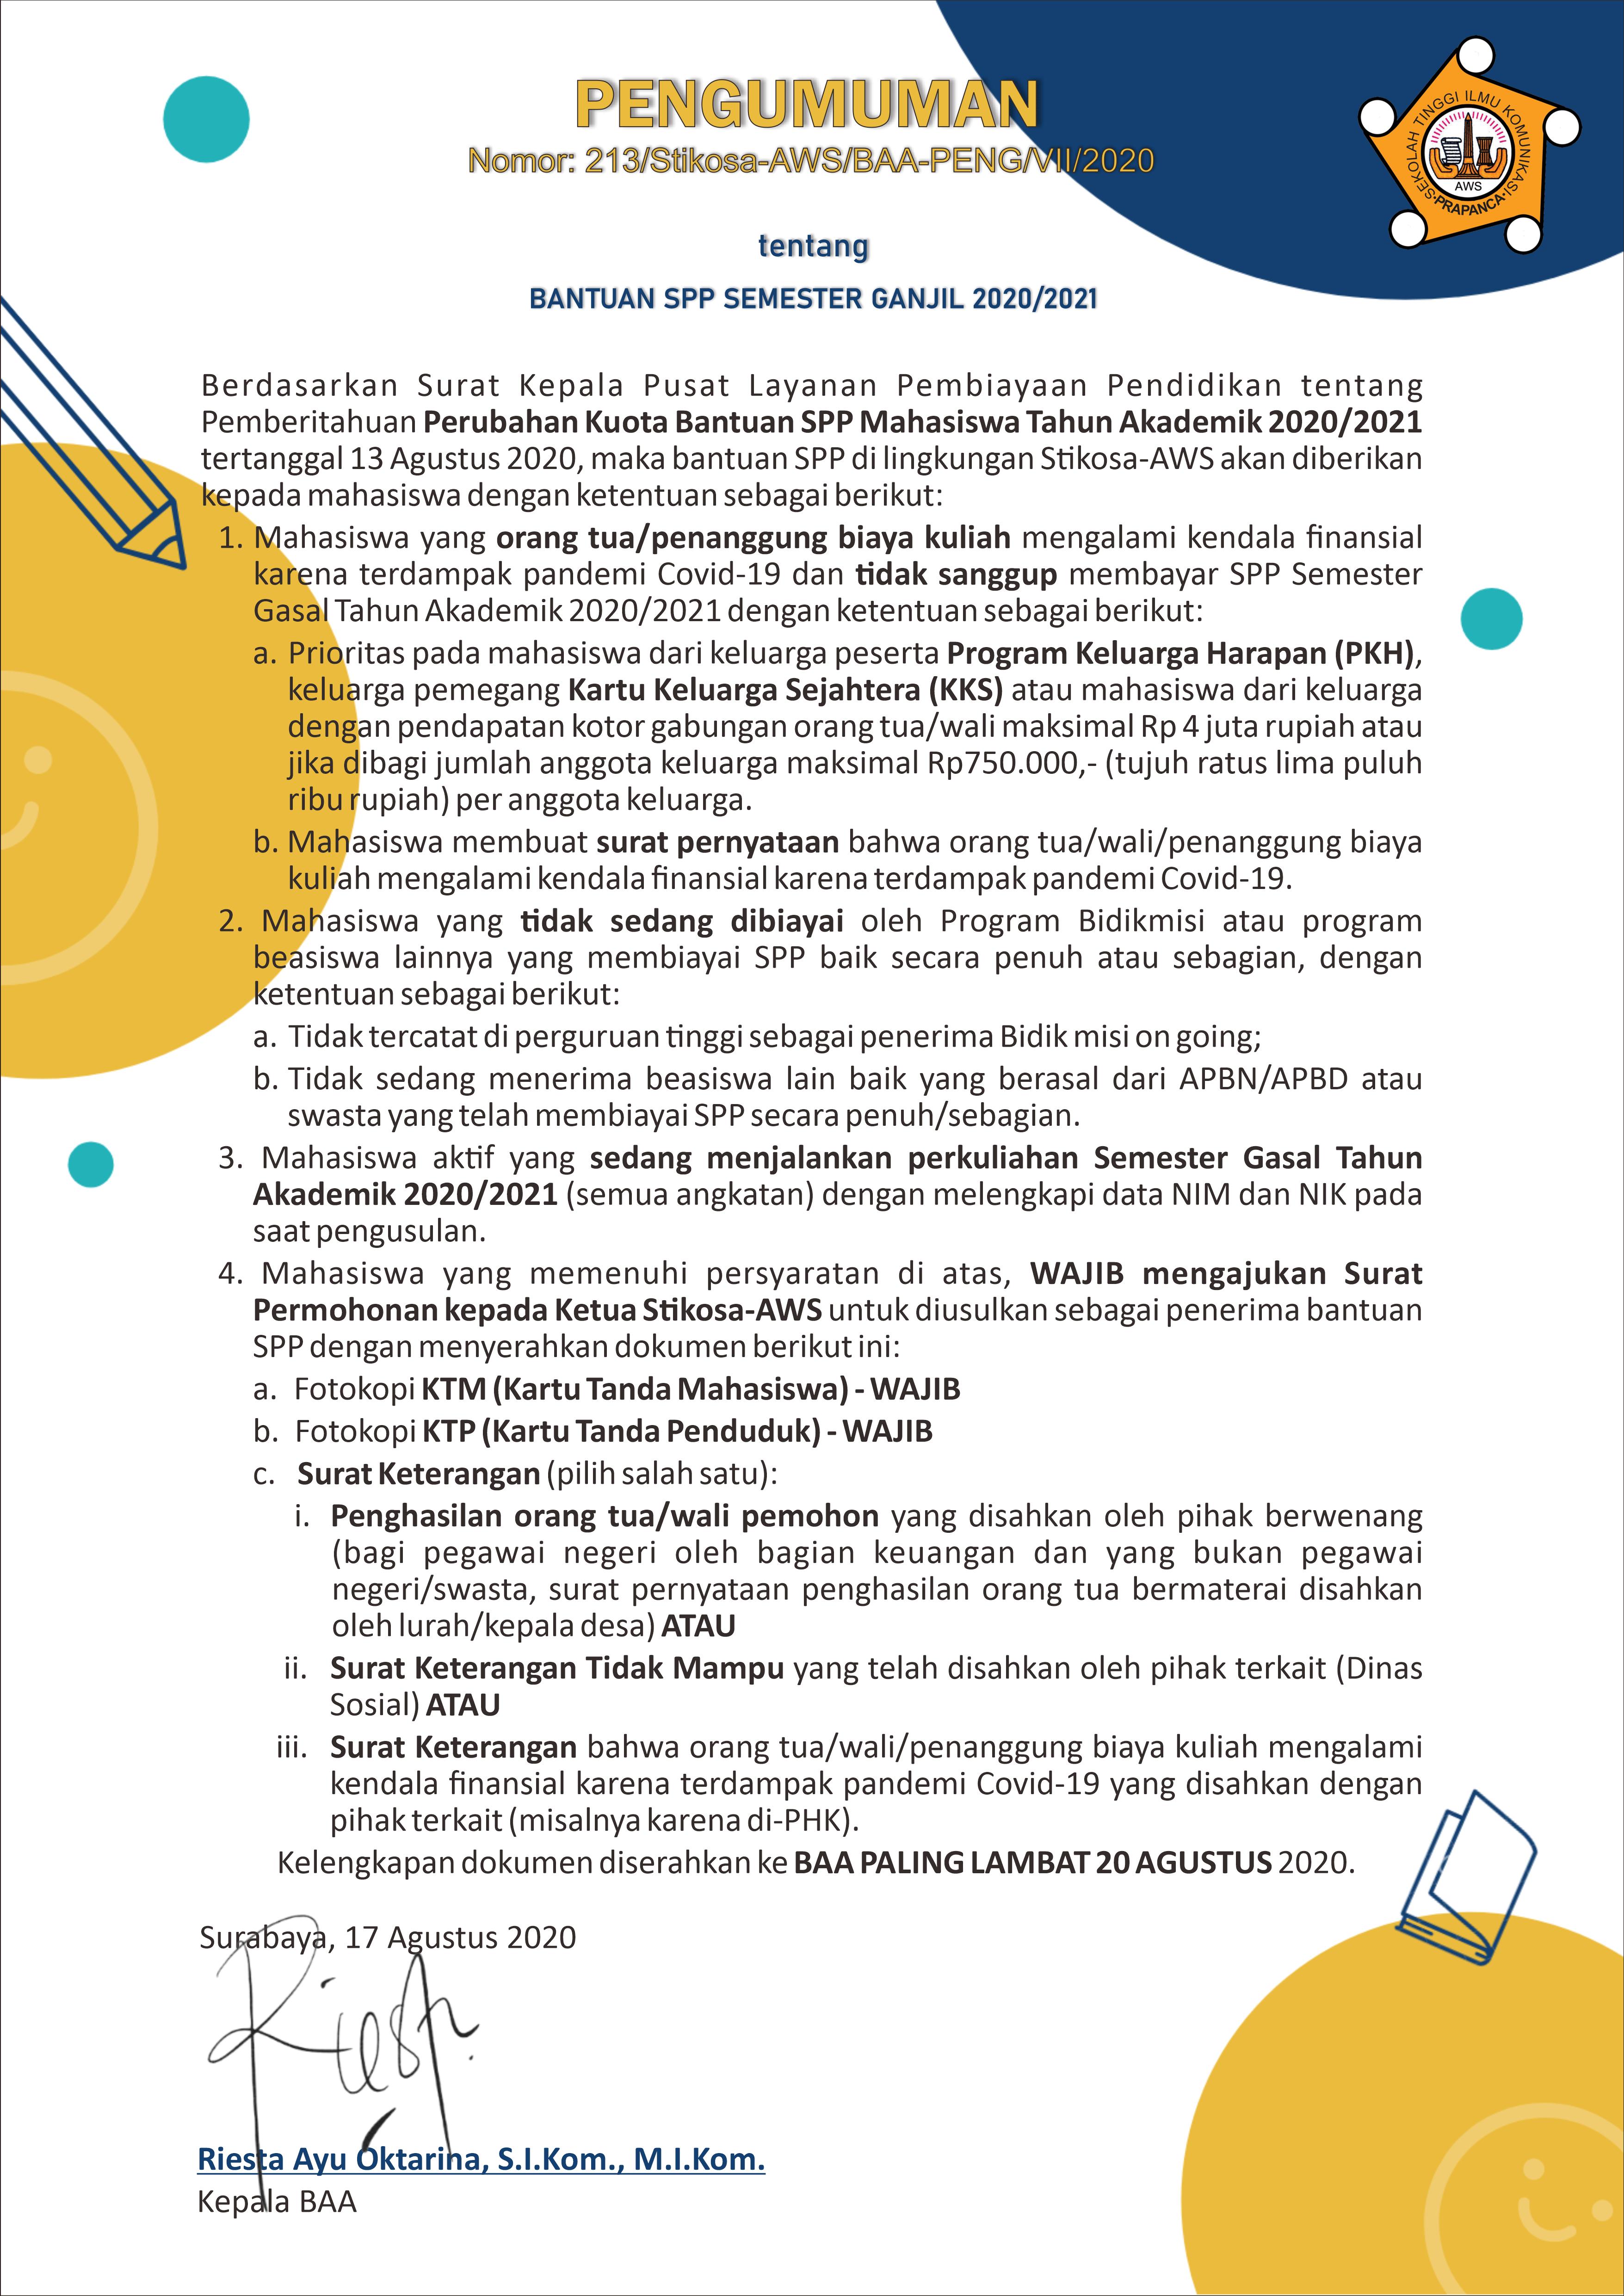 Bantuan SPP Semester Ganjil 2020